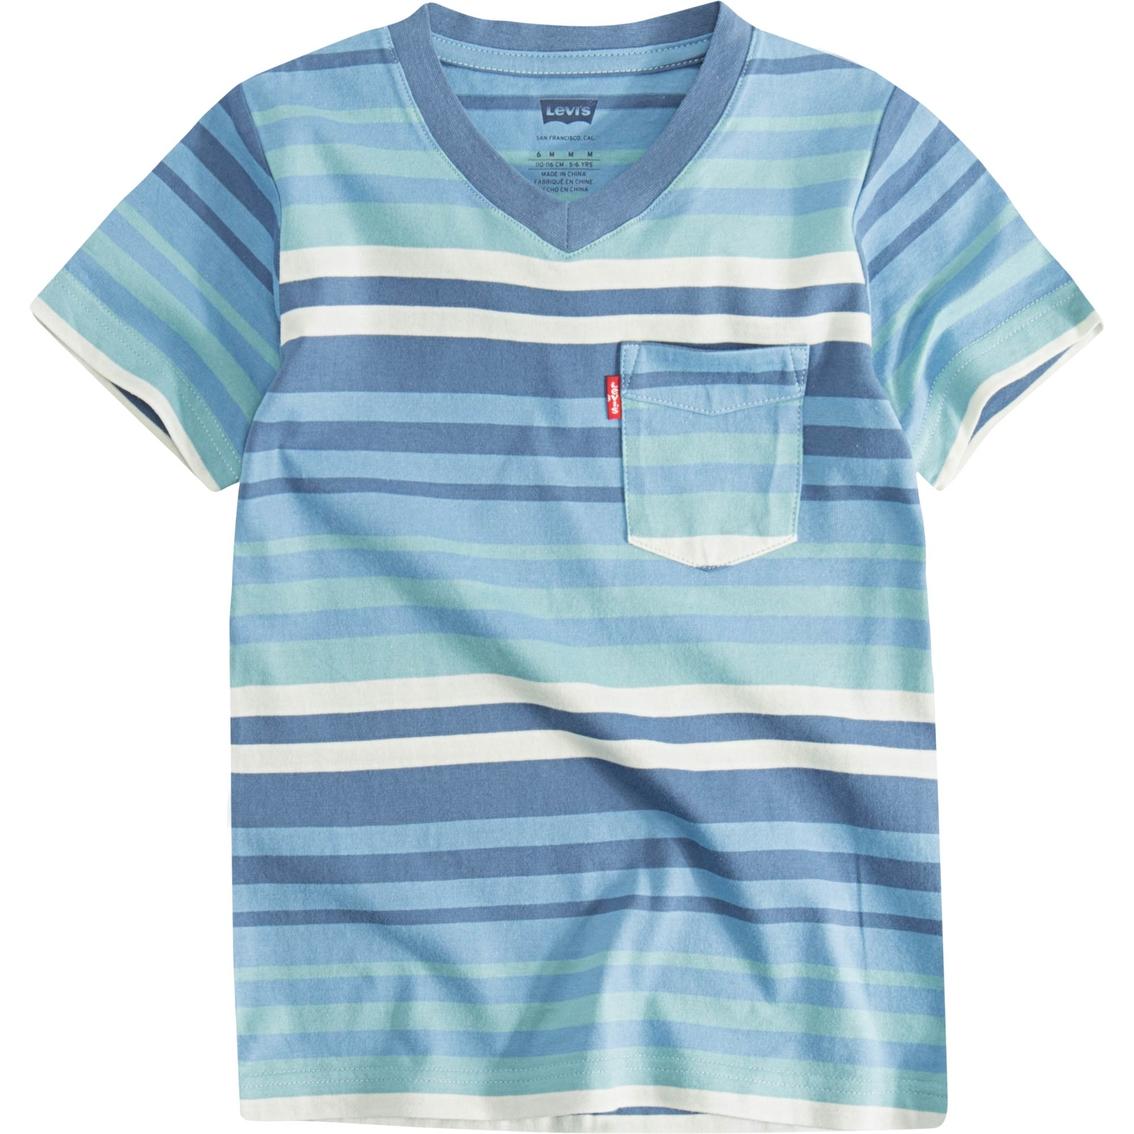 47203d66f Levi's Toddler Boys Striped Sunset Pocket Tee | Toddler Boys 2t-4t ...